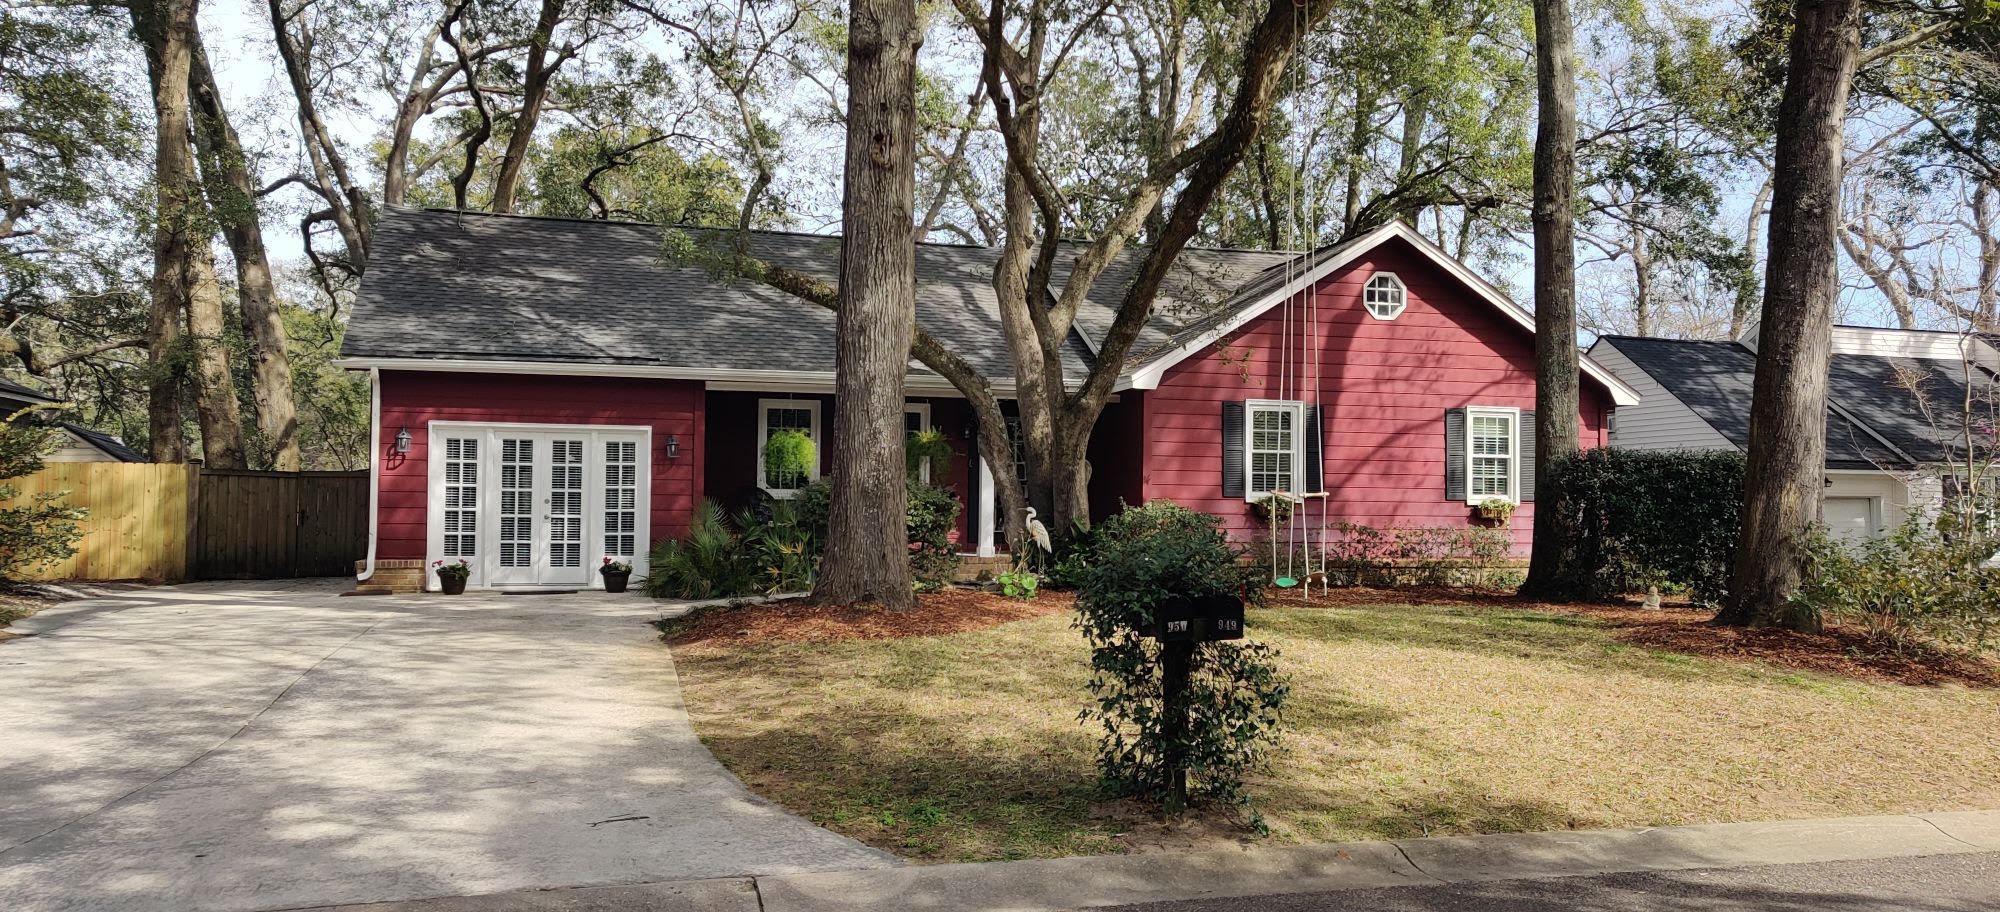 Shemwood II Homes For Sale - 950 Sea Gull, Mount Pleasant, SC - 23